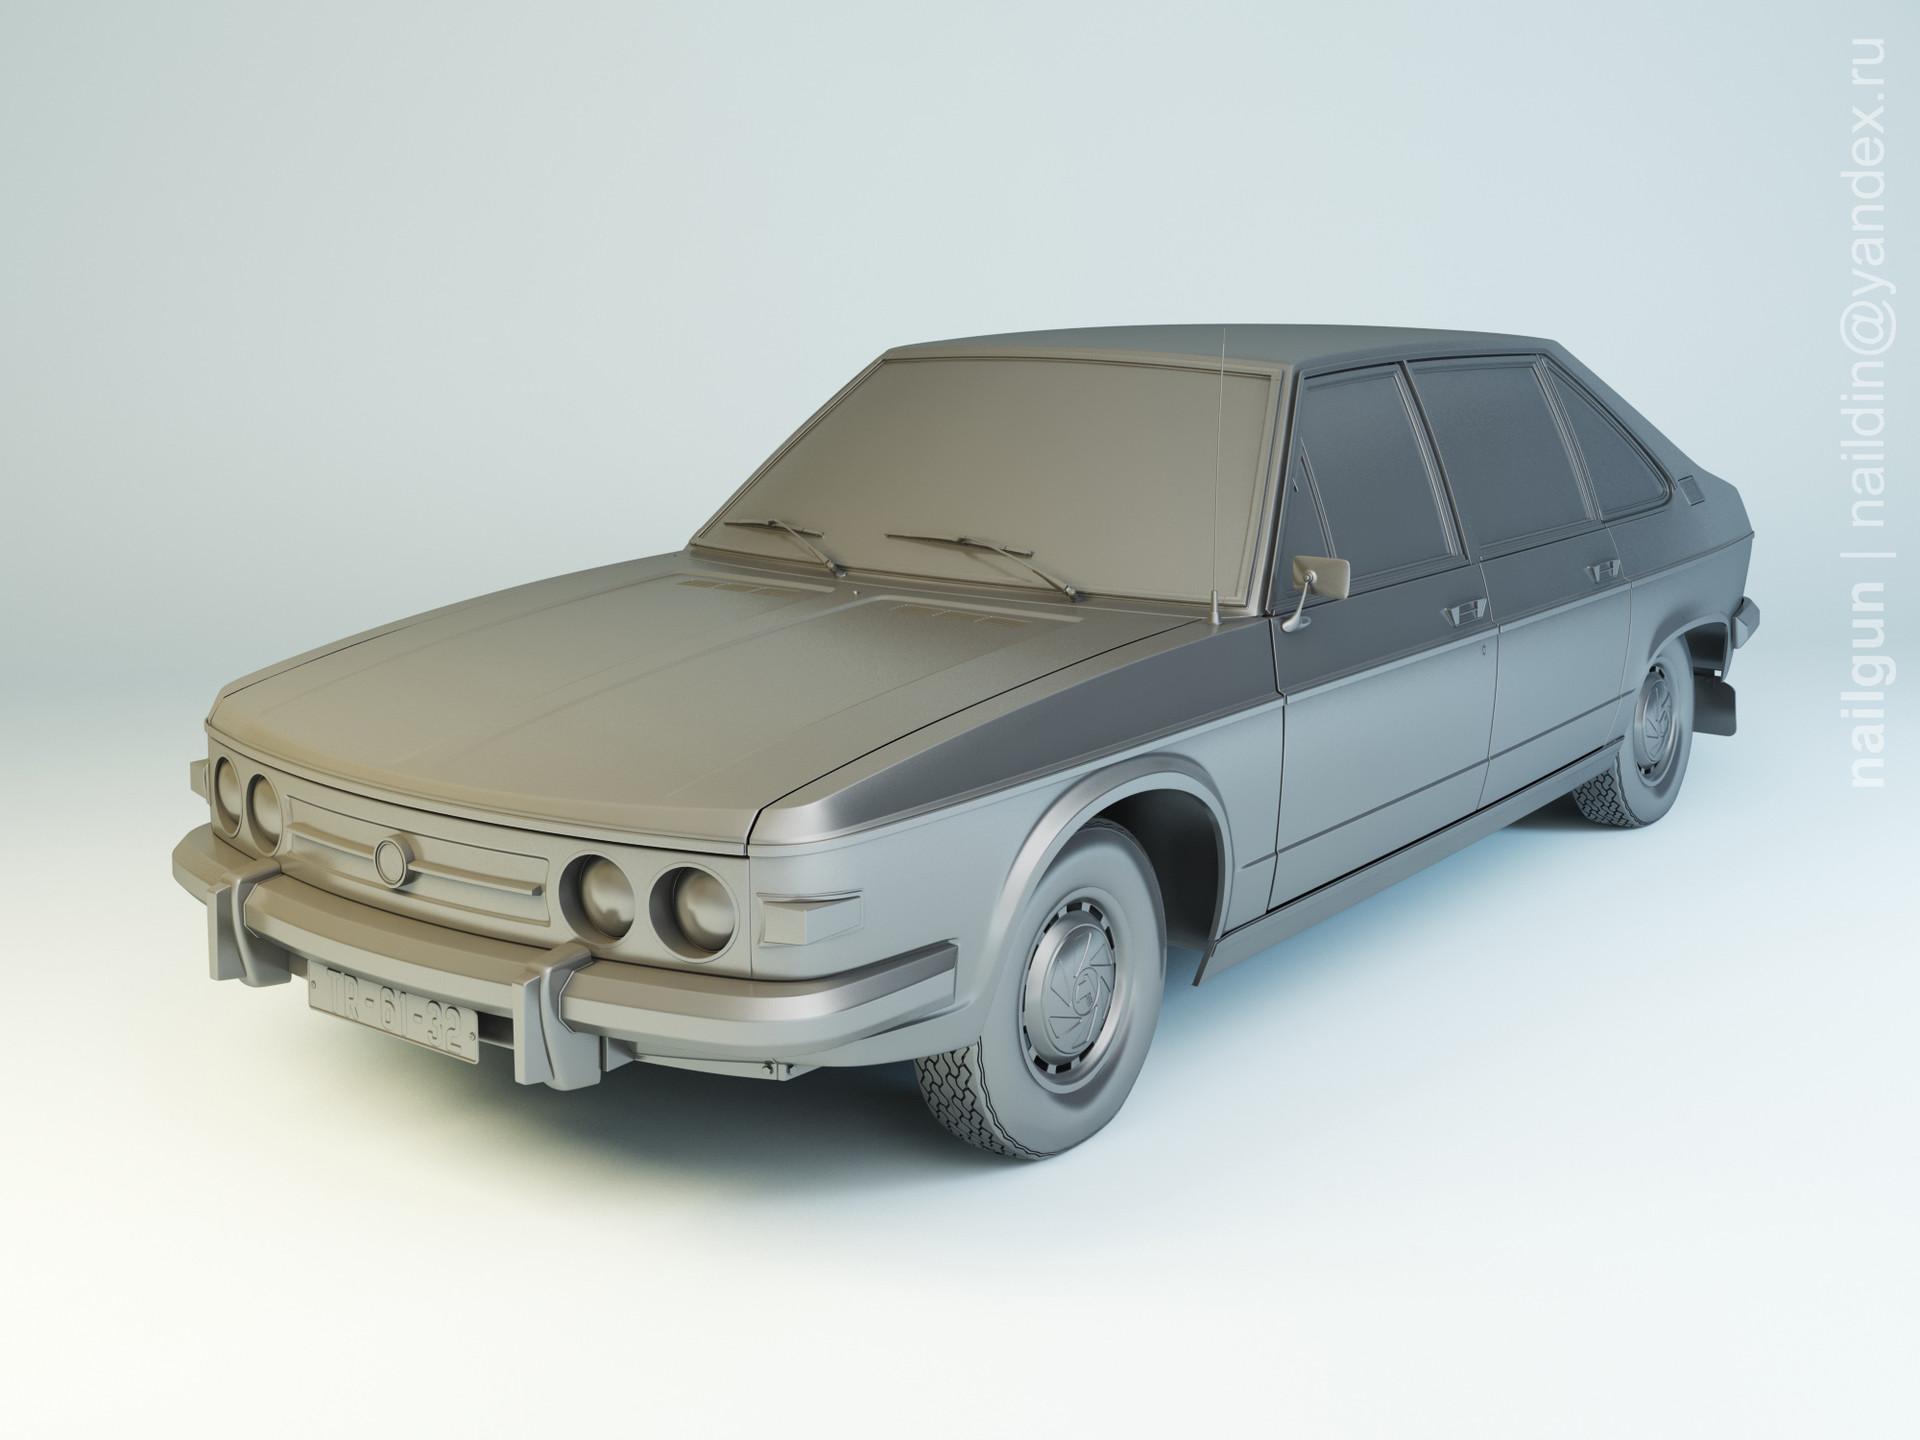 Nail khusnutdinov als 160 003 tatra 613 1 modelling 0